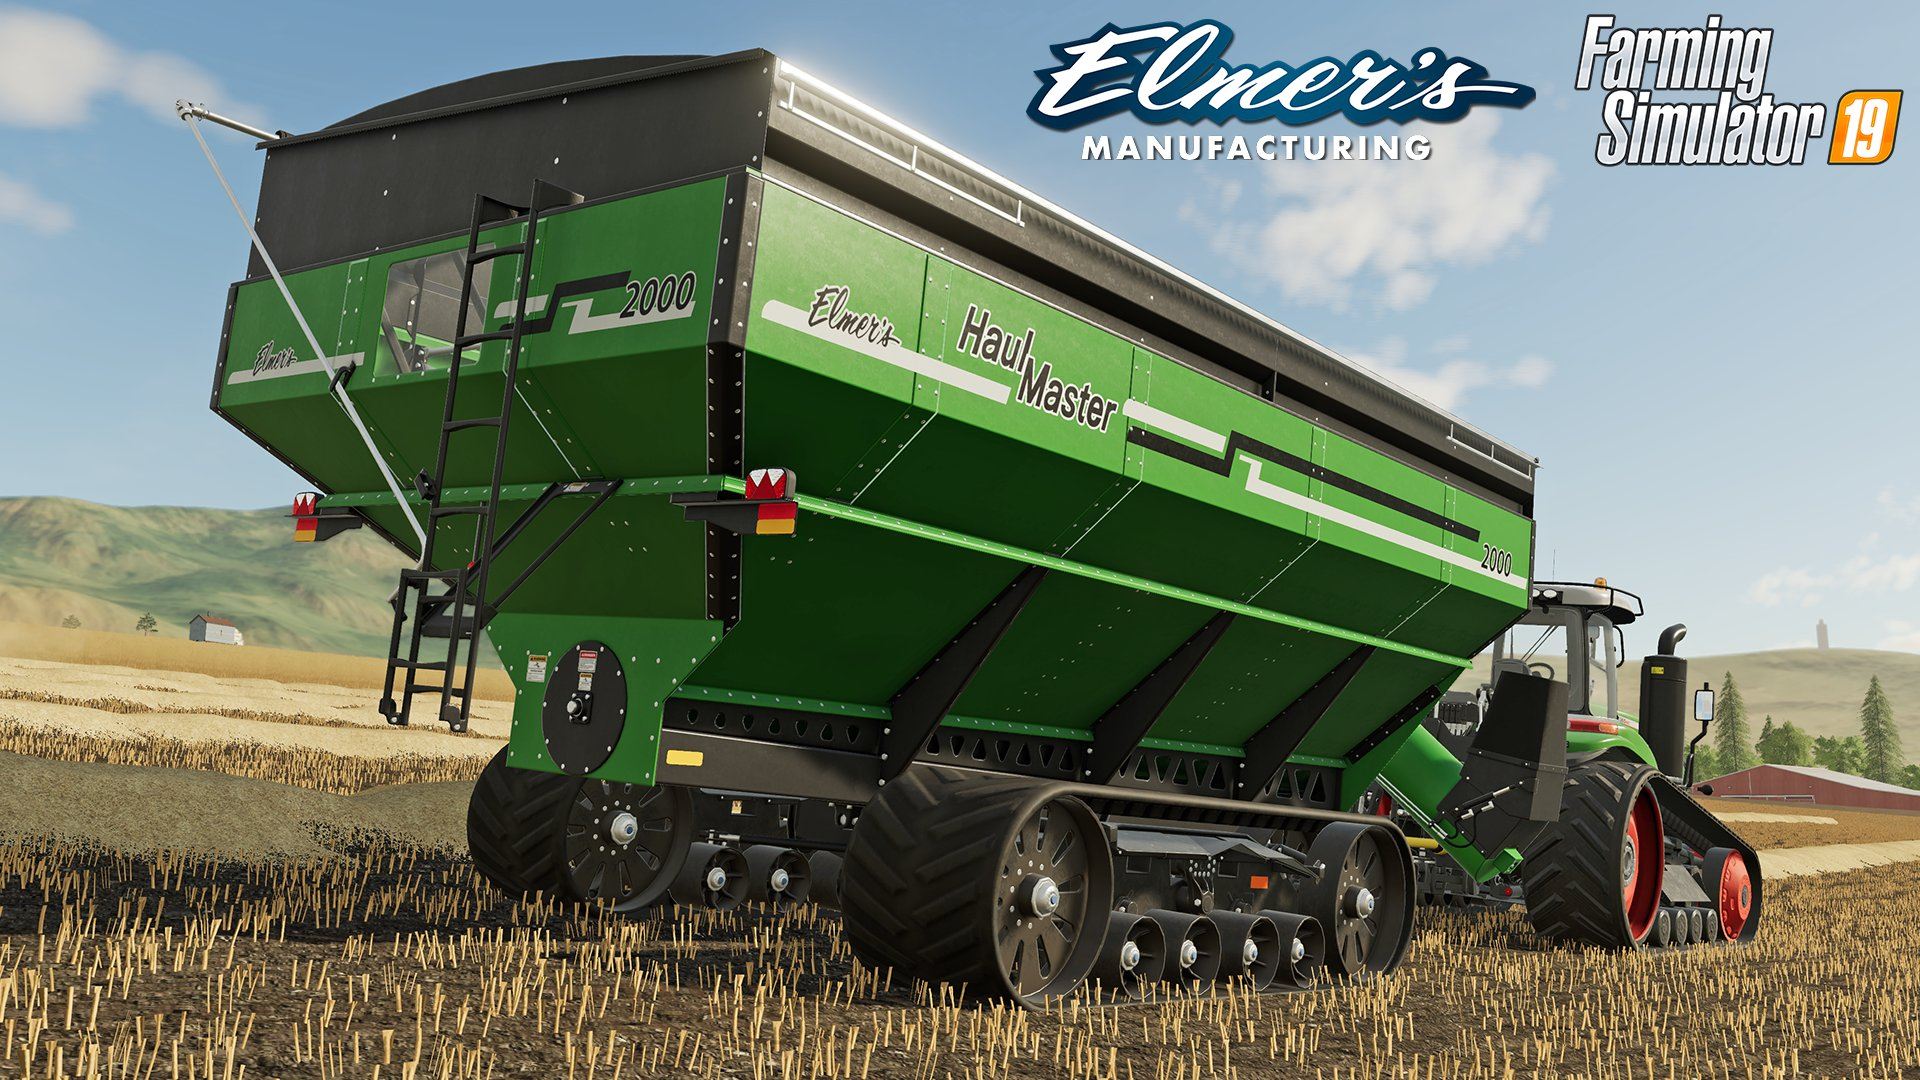 Farming Simulator 19 will have The Elmer's Manufacturing Haulmaster